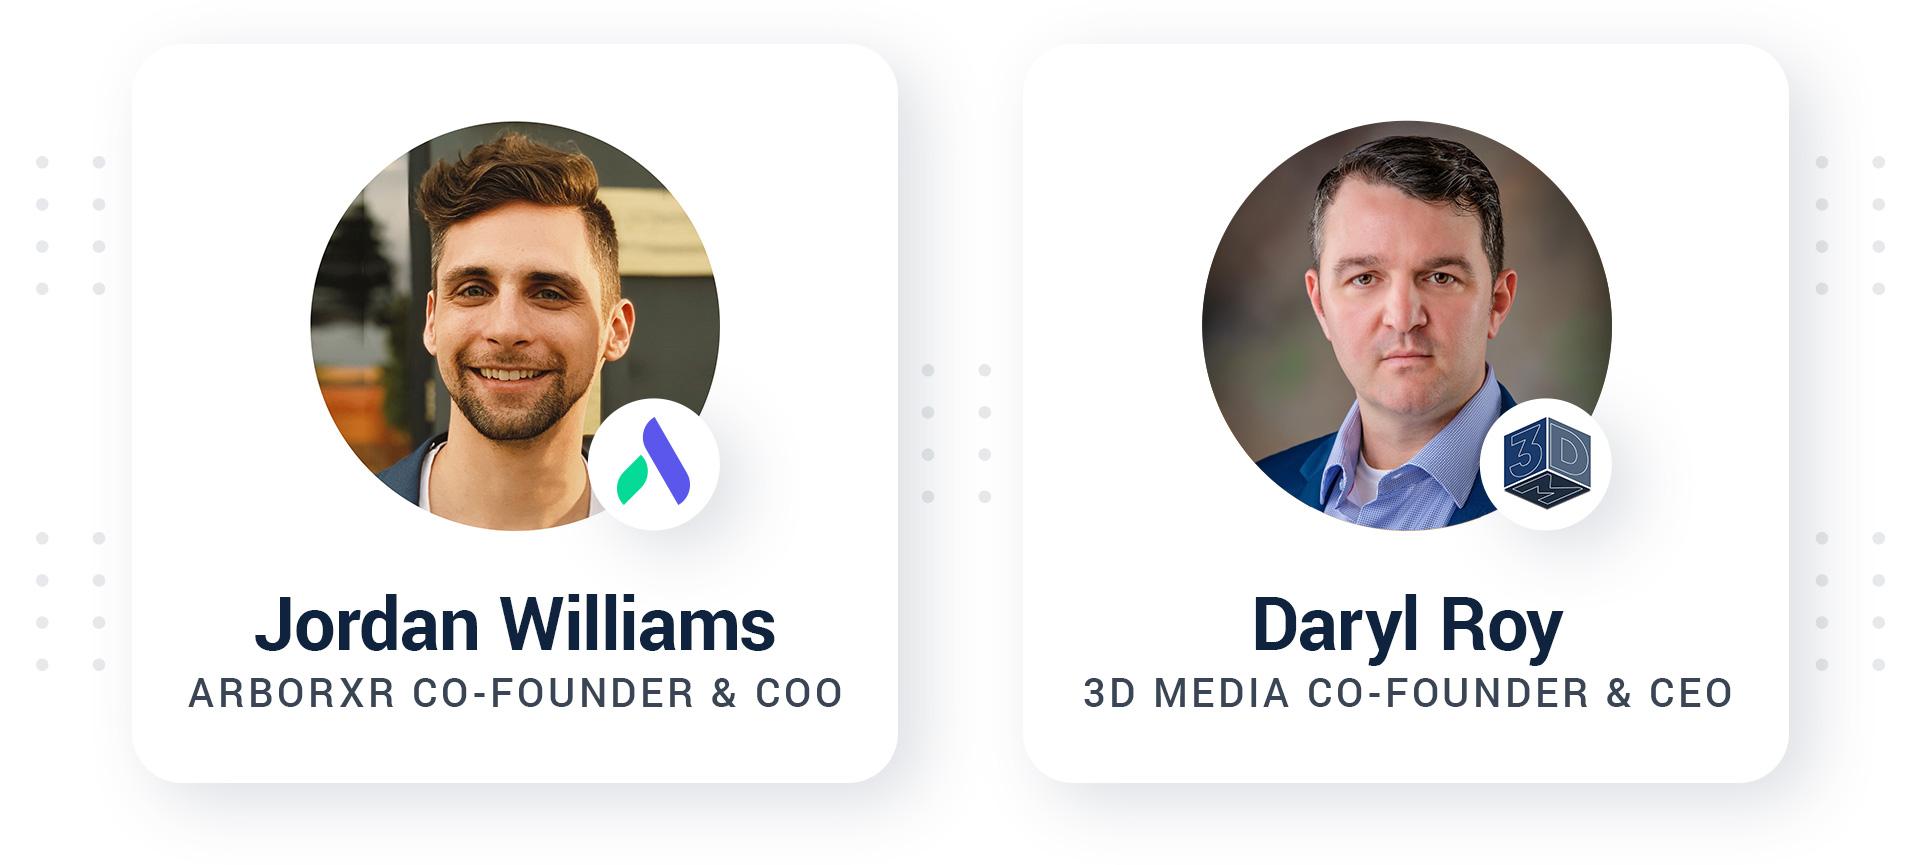 Jordan Williams of ArborXR and Daryl Roy of 3D Media